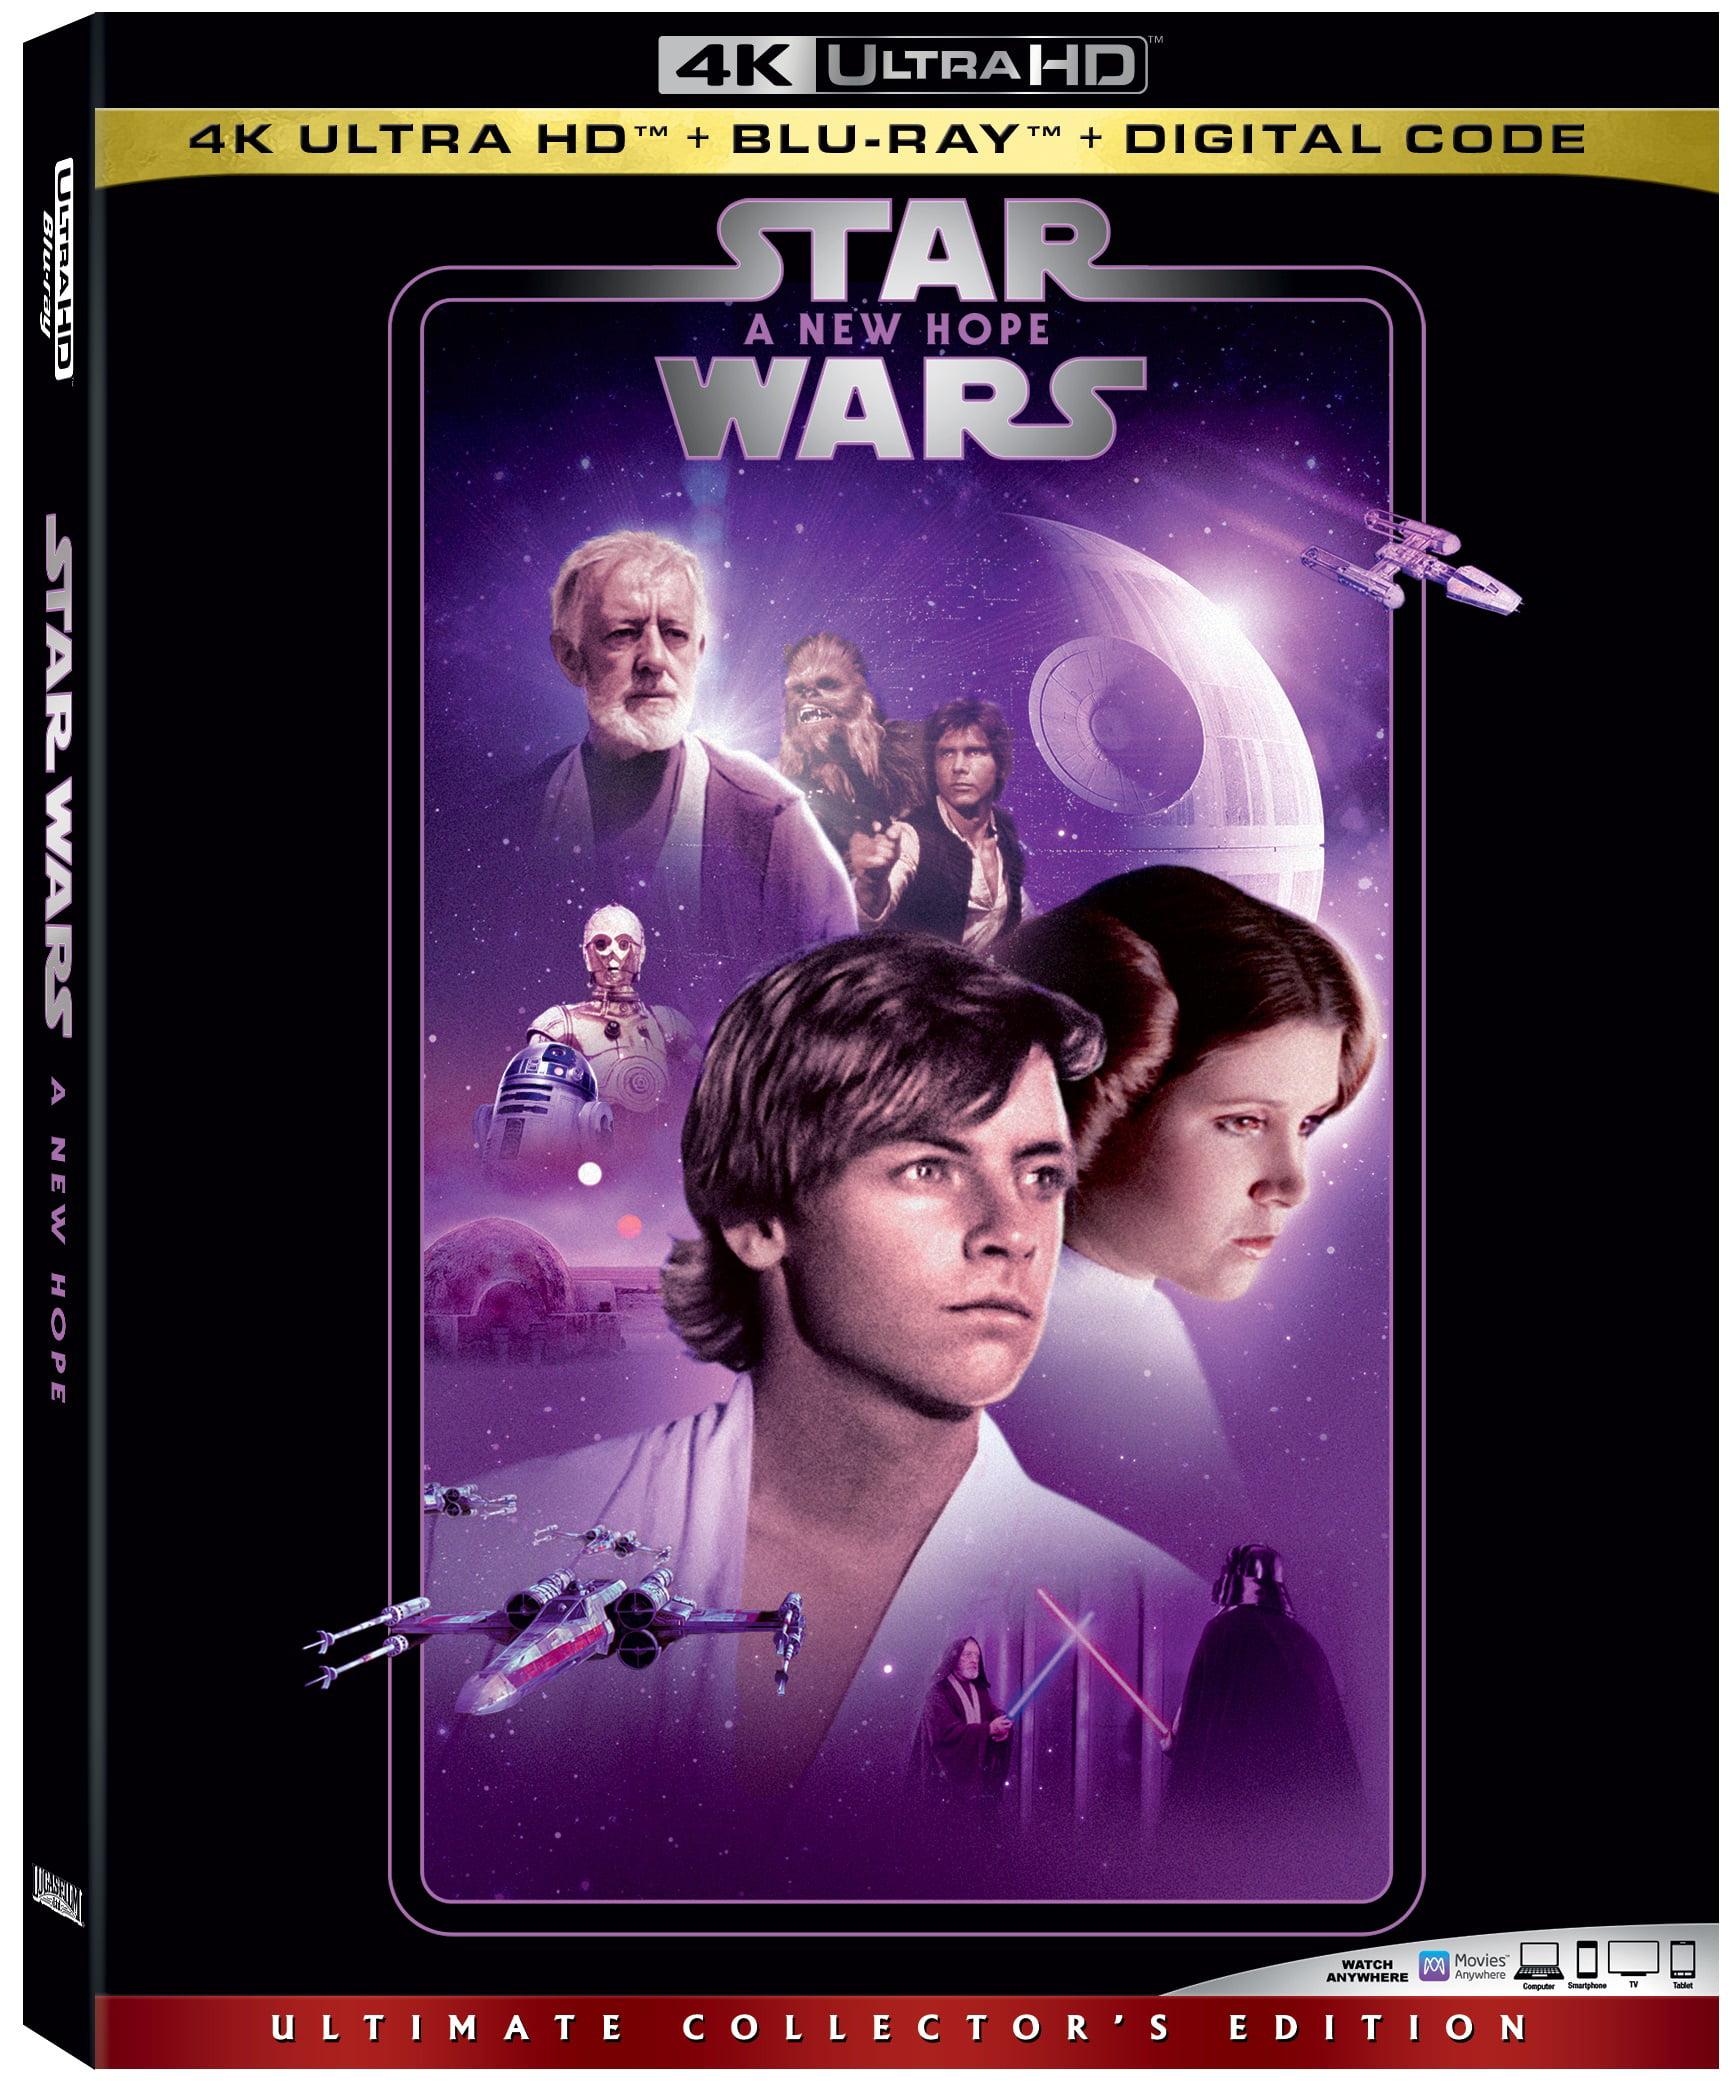 Star Wars Episode Iv A New Hope 4k Ultra Hd Blu Ray Digital Copy Walmart Com Walmart Com